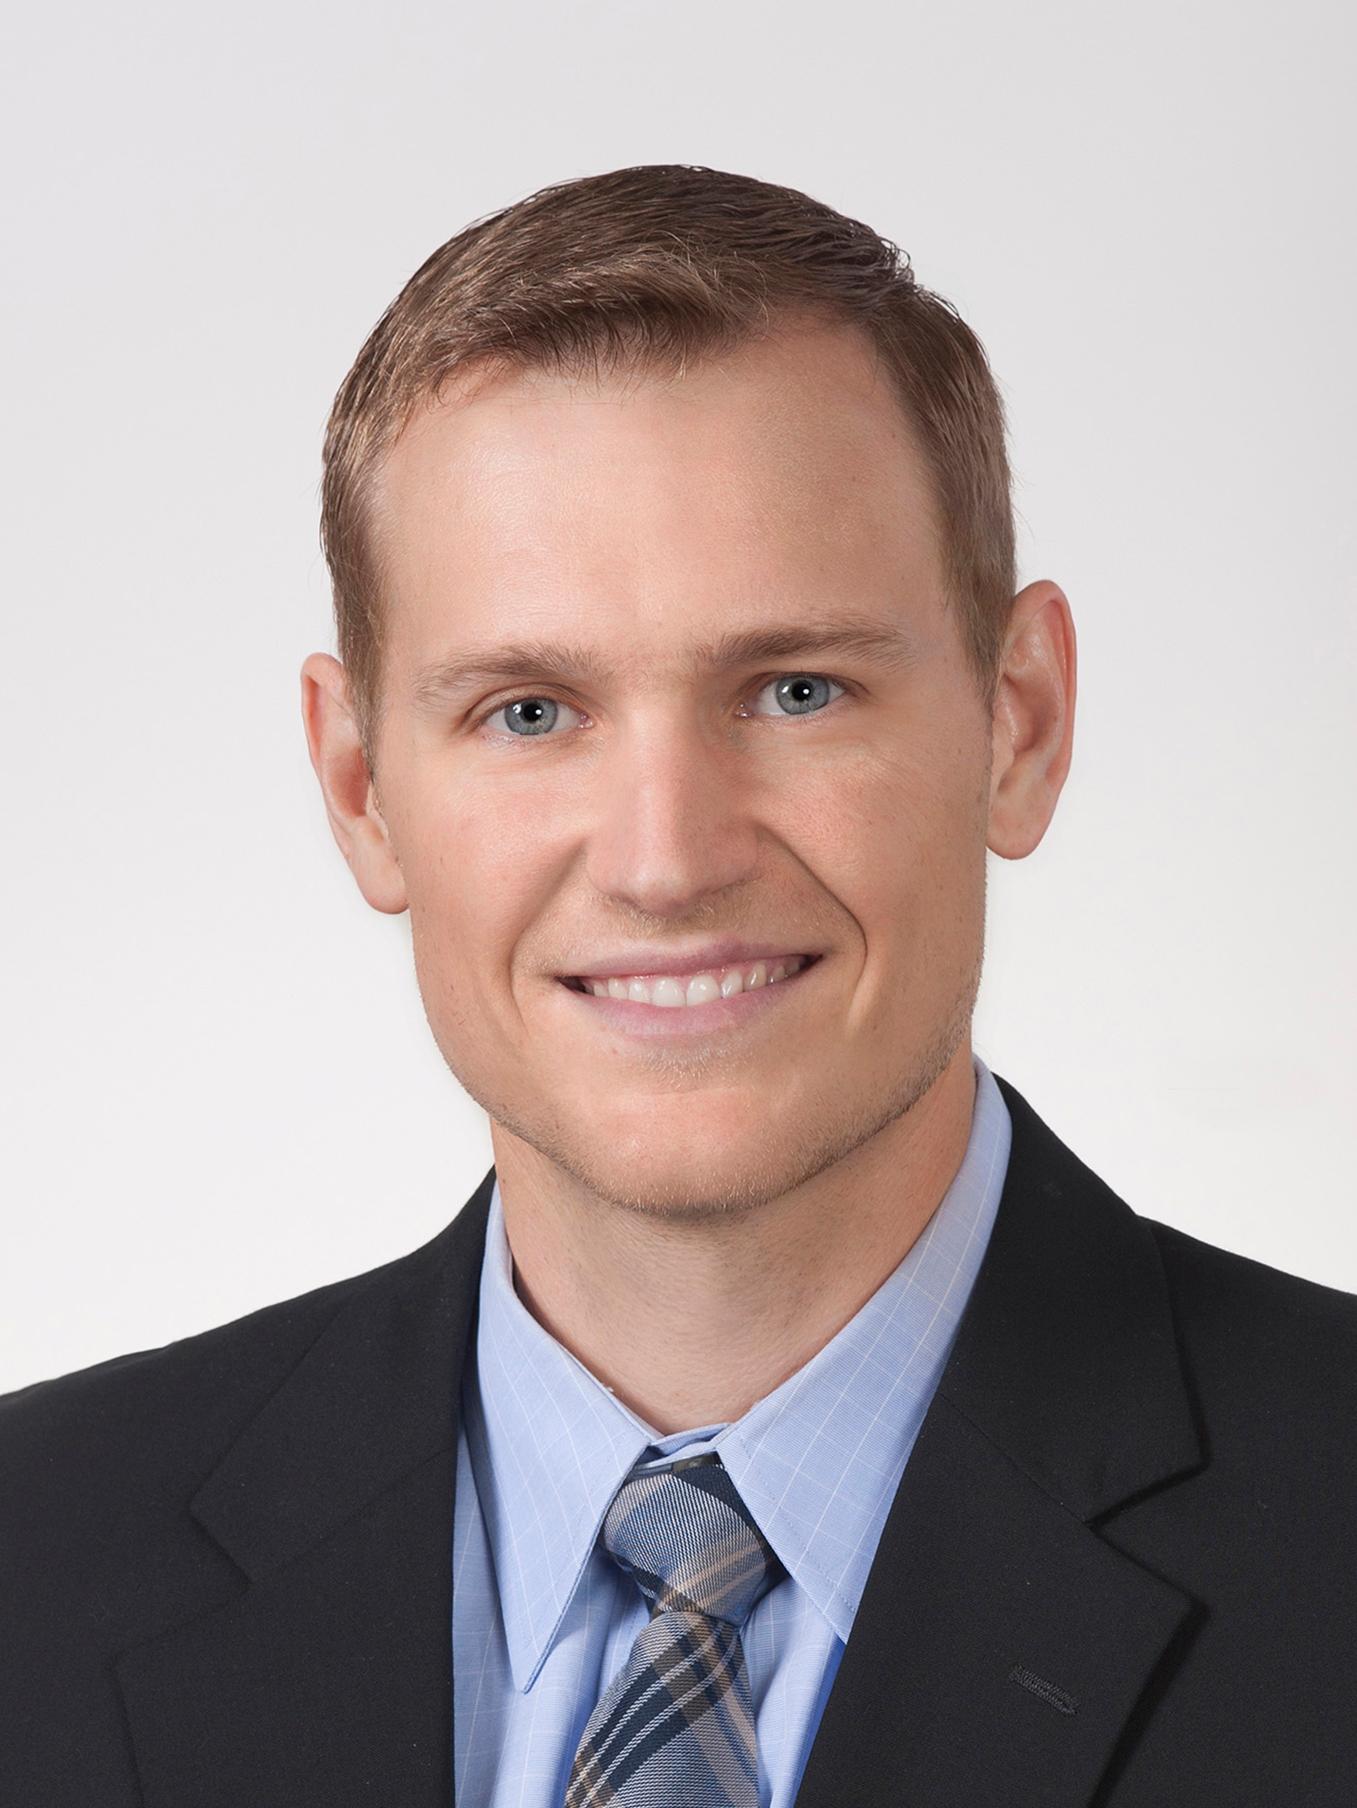 Regan S. Teague, Portfolio Manager at Day Hagan Mutual Funds in Sarasota, FL.